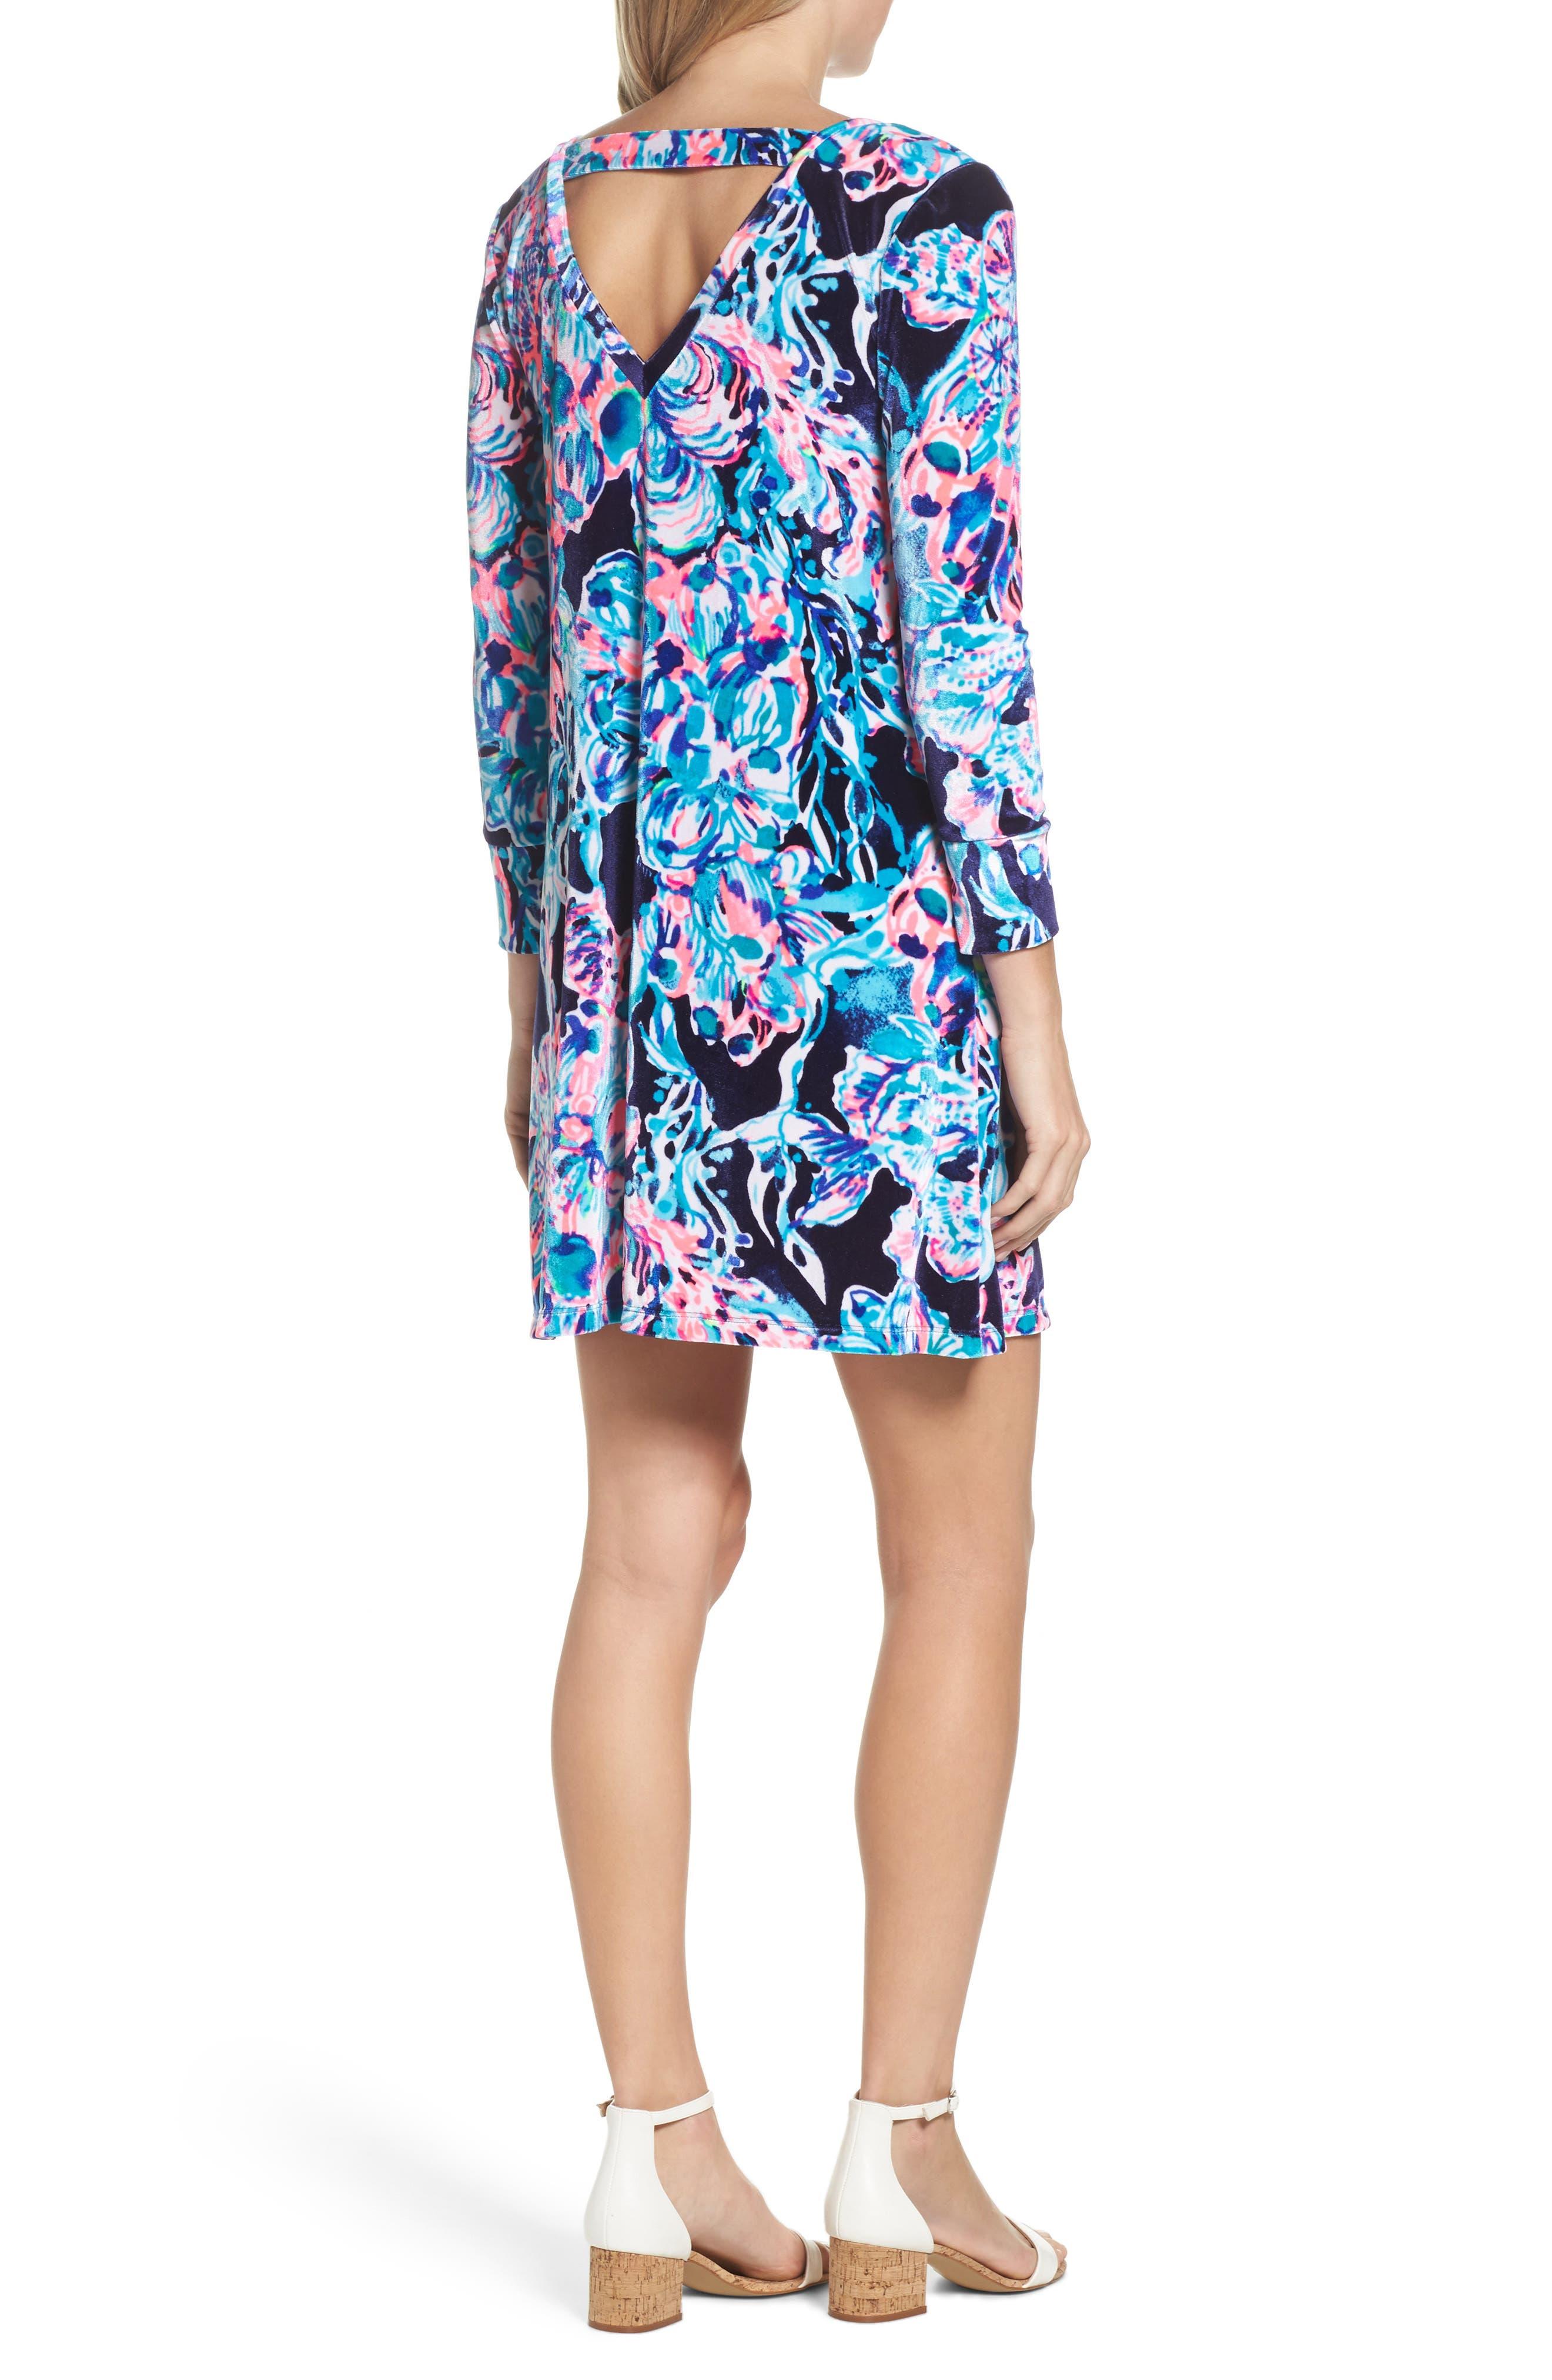 Olive Swing Dress,                             Alternate thumbnail 2, color,                             410